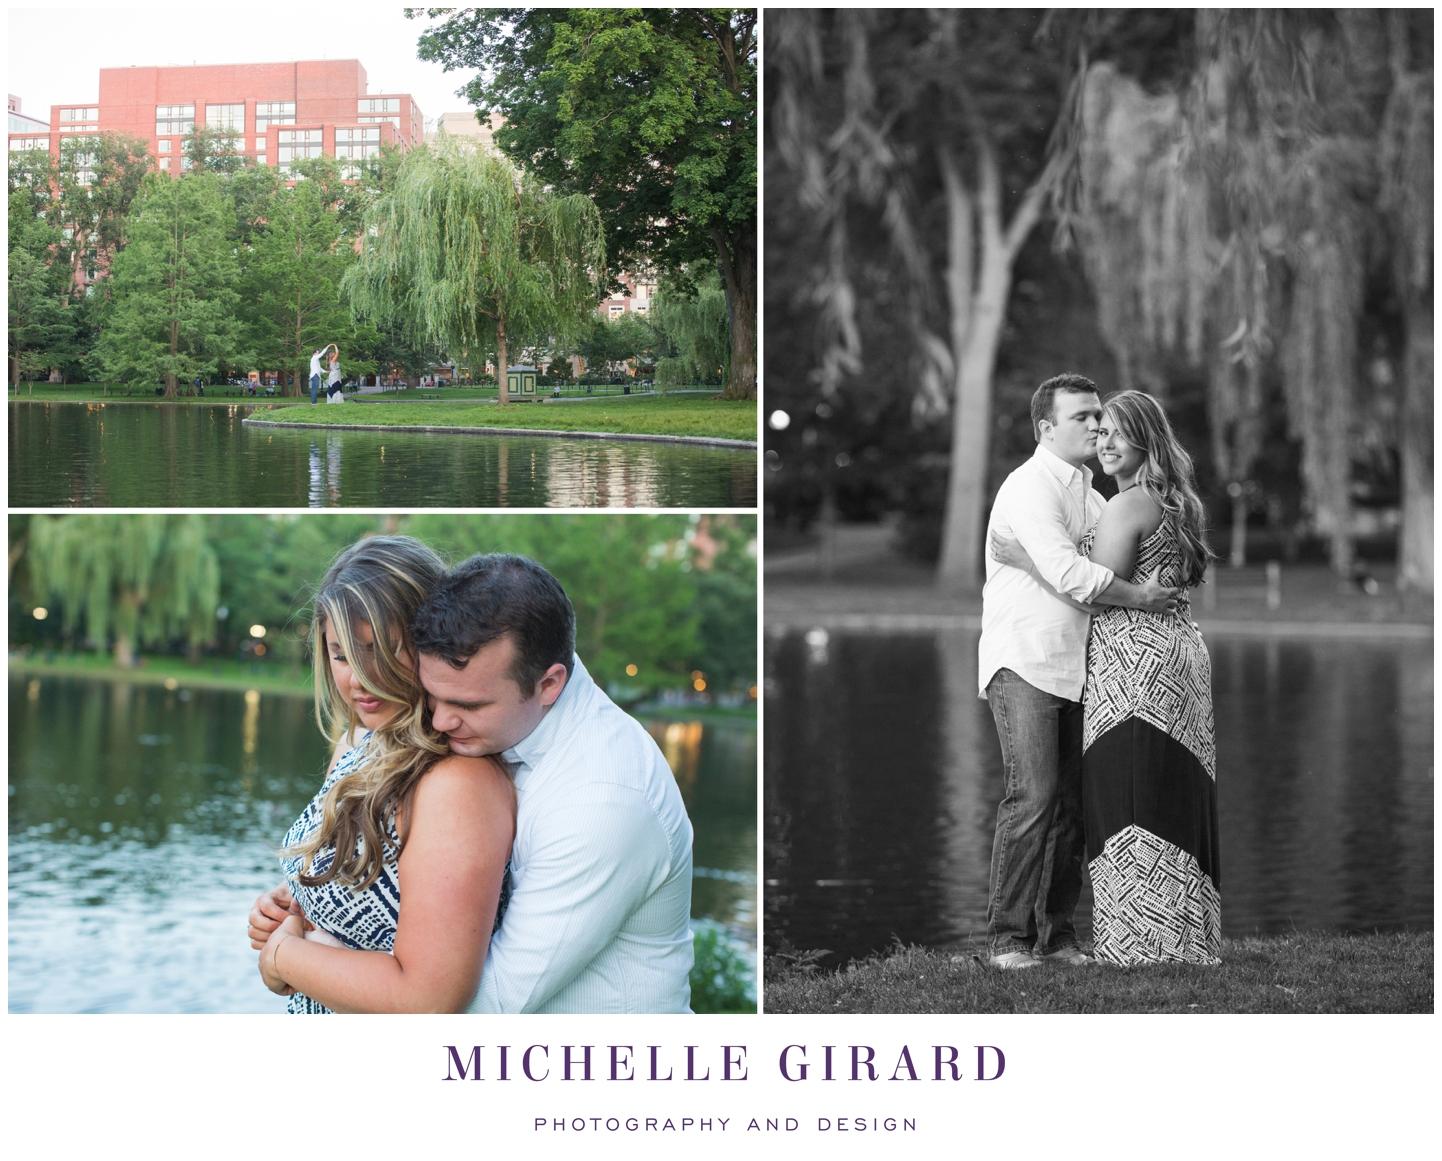 BostonCommonsGardens_BostonEngagementSession_MichelleGirardPhotography05.jpg